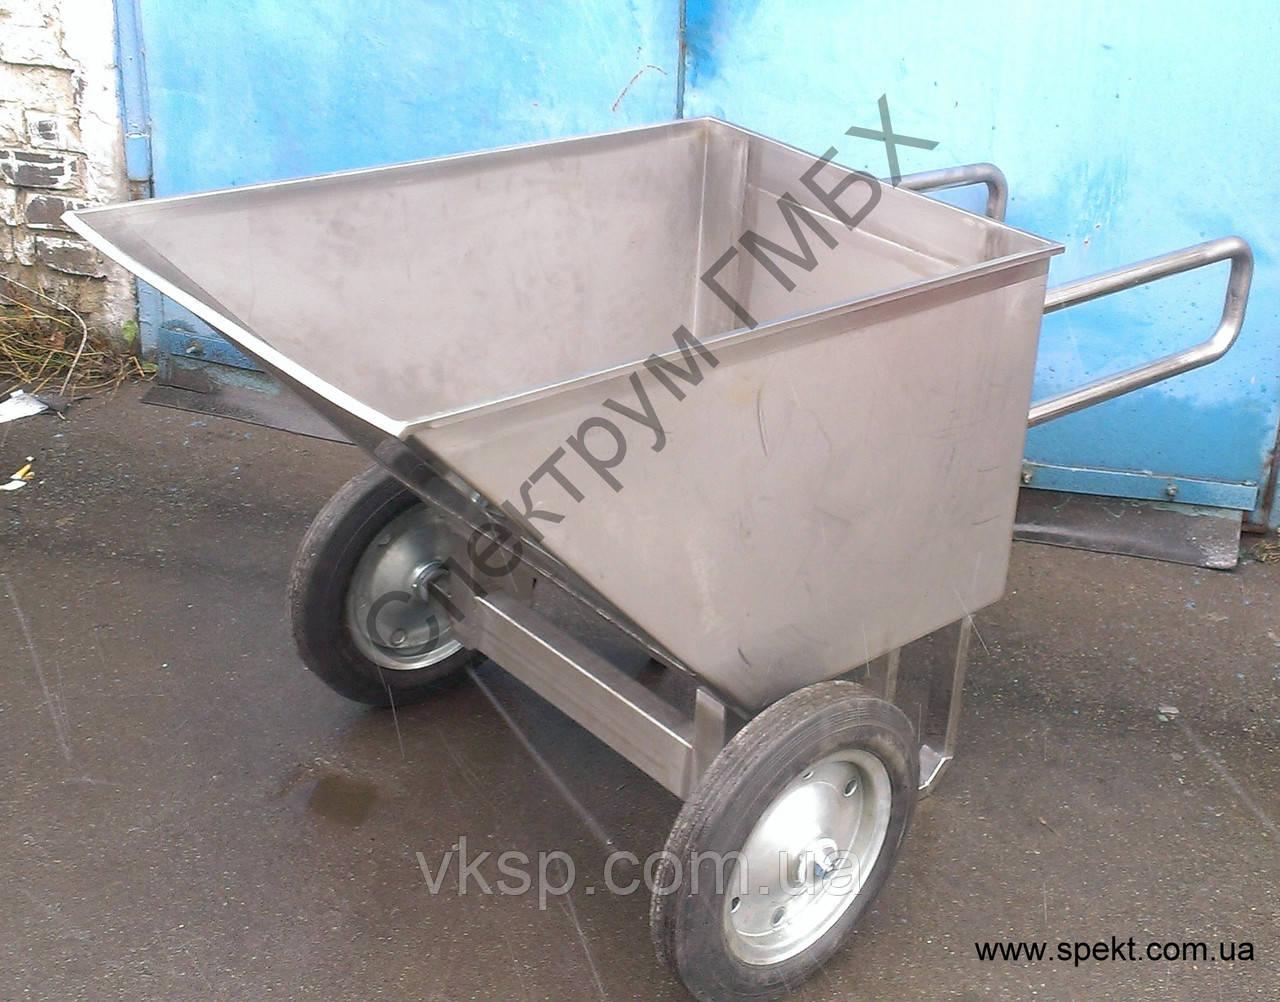 Рикша усиленная, тележка для перевозки творога